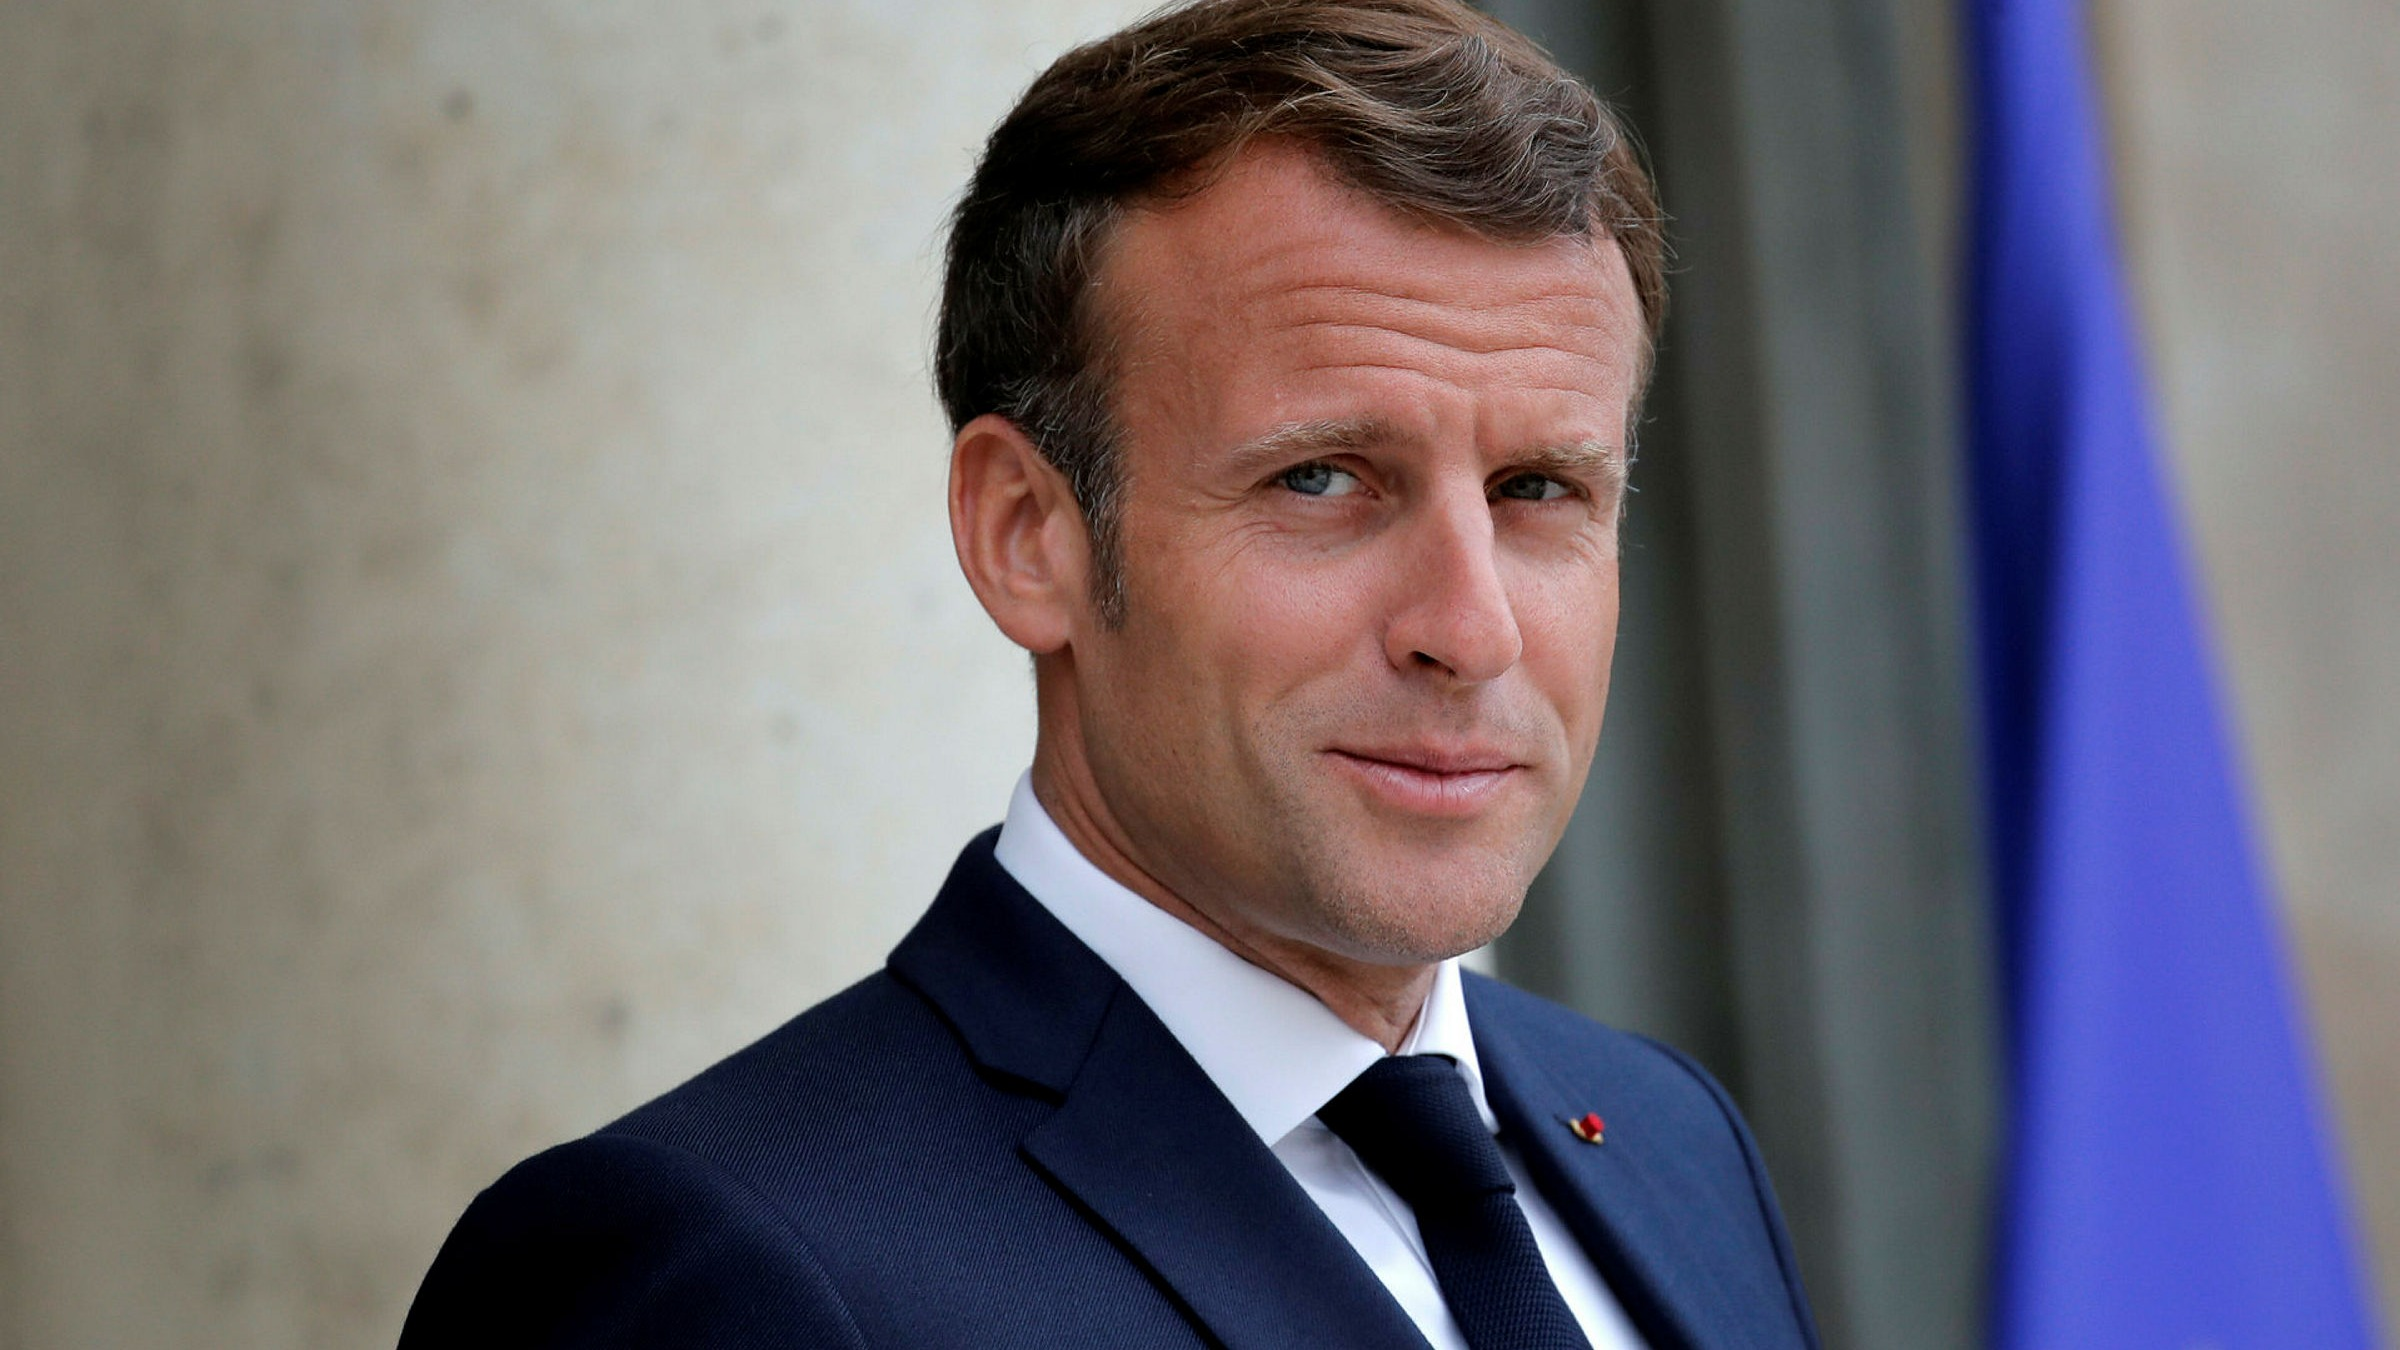 Emmanuel Macron S Low Profile On China Is Strategic Financial Times